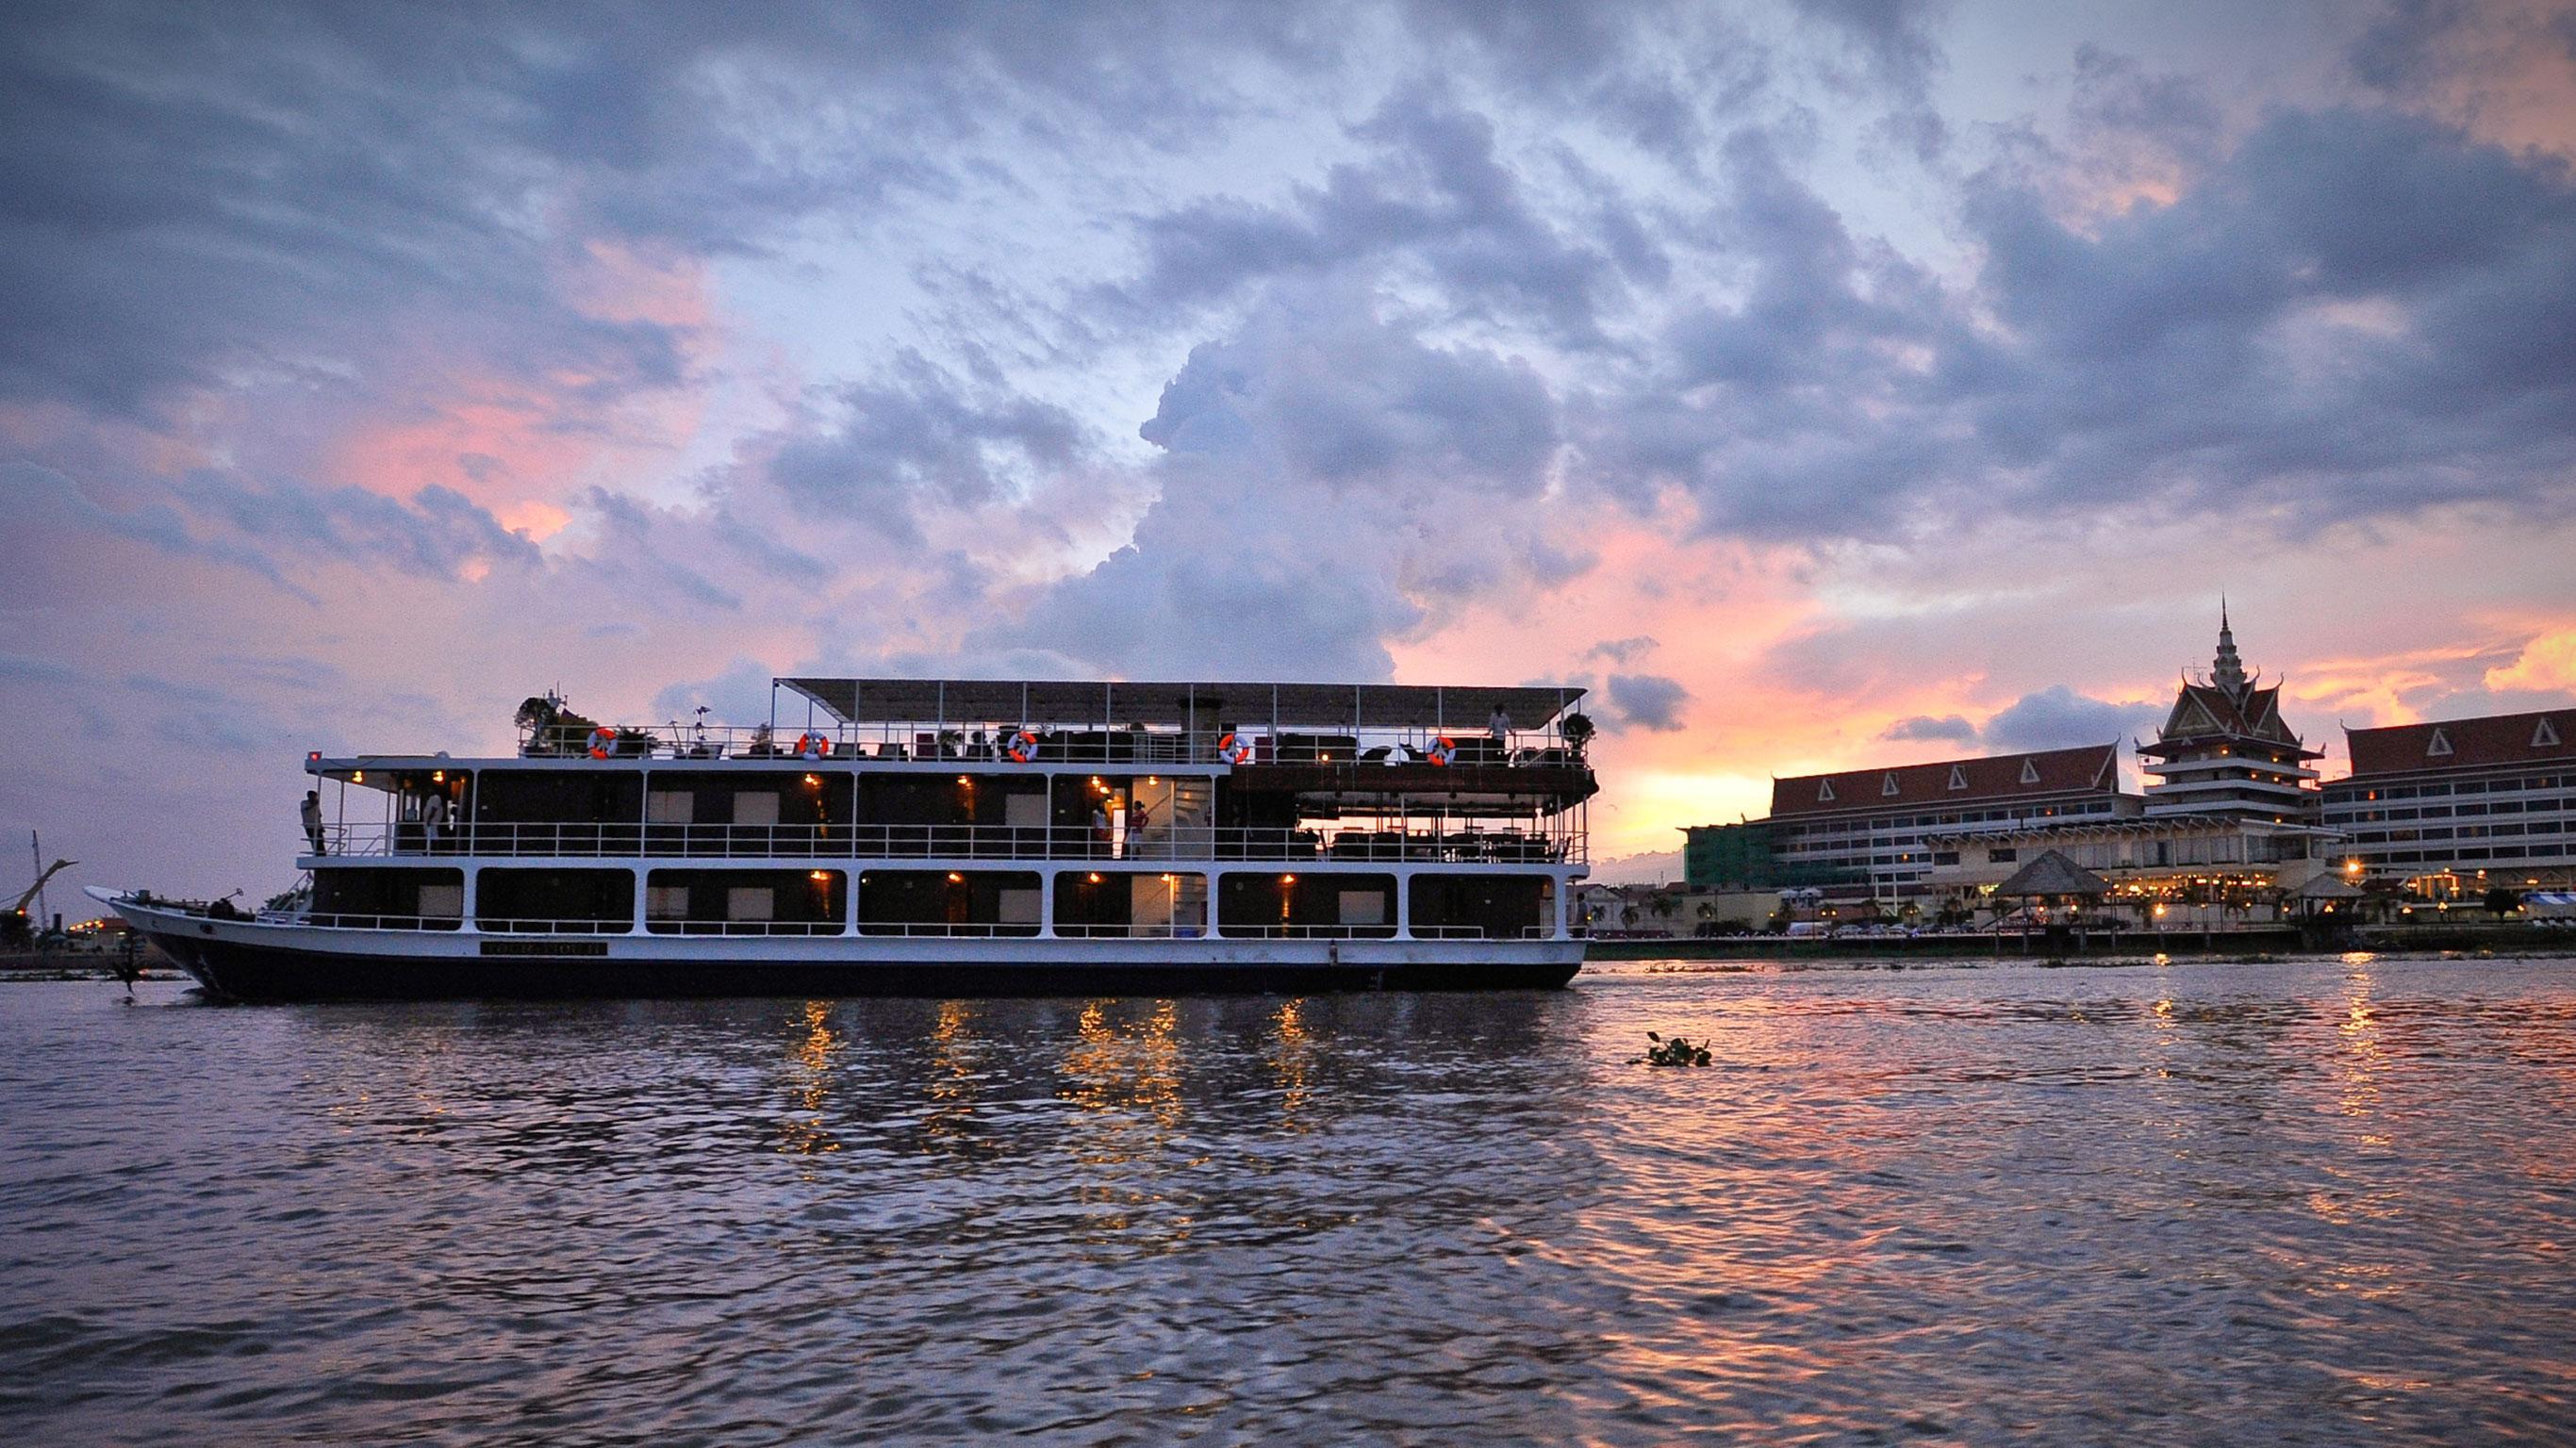 Mekong Kreuzfahrt – Von Ho-Chi-Minh-Stadt nach Siem Reap